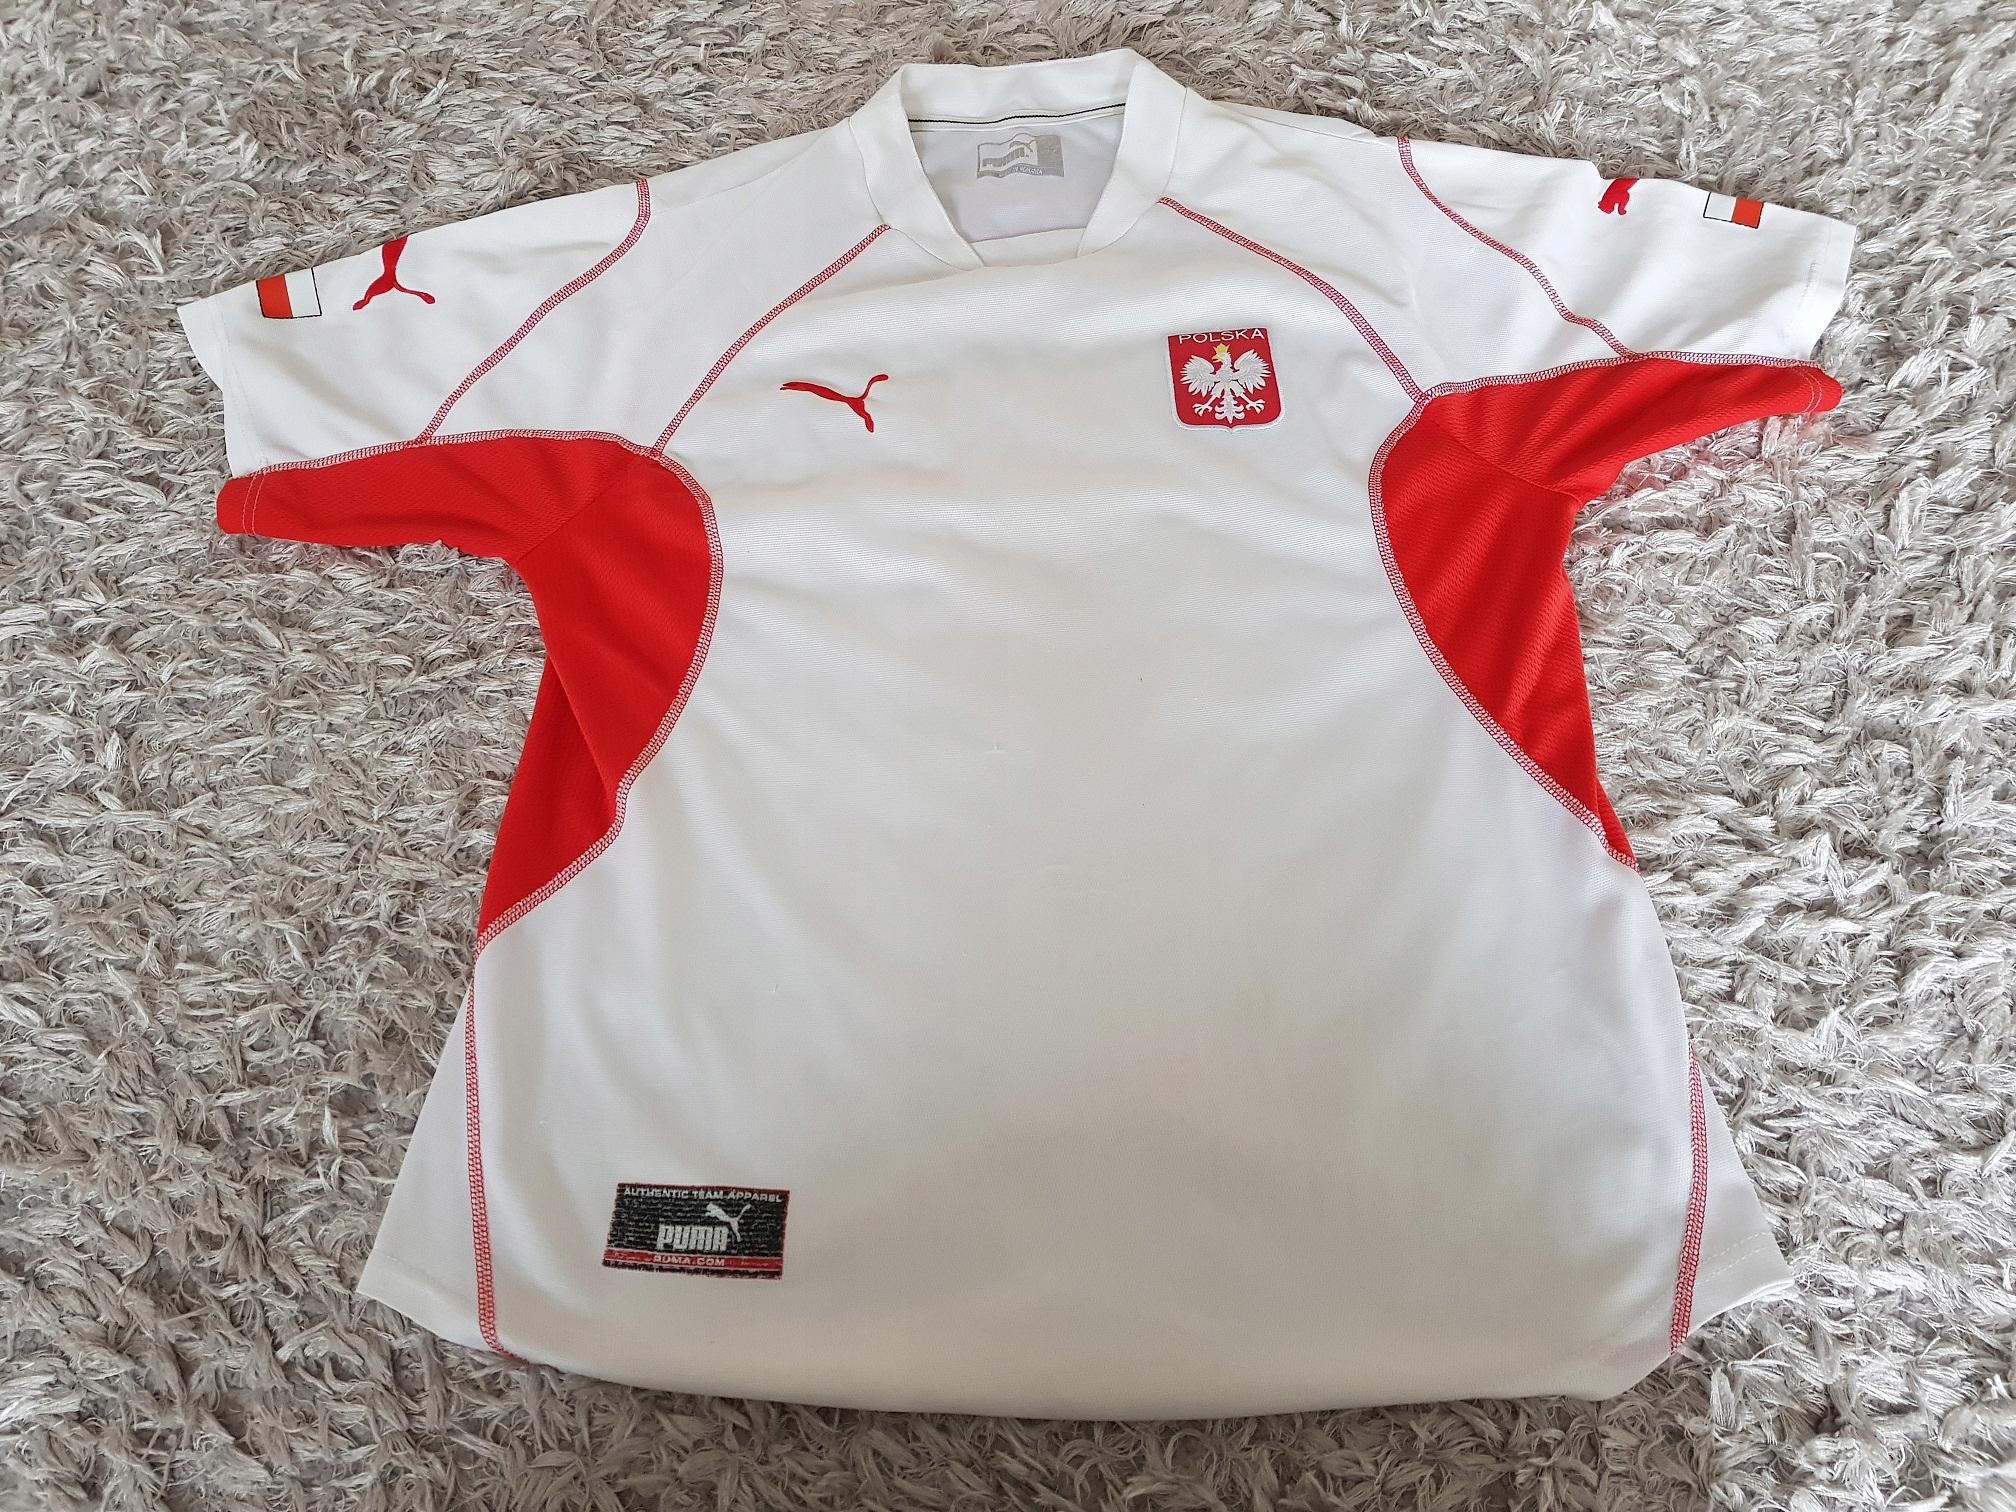 Oryginalna Koszulka Reprezentacji Polski Puma L